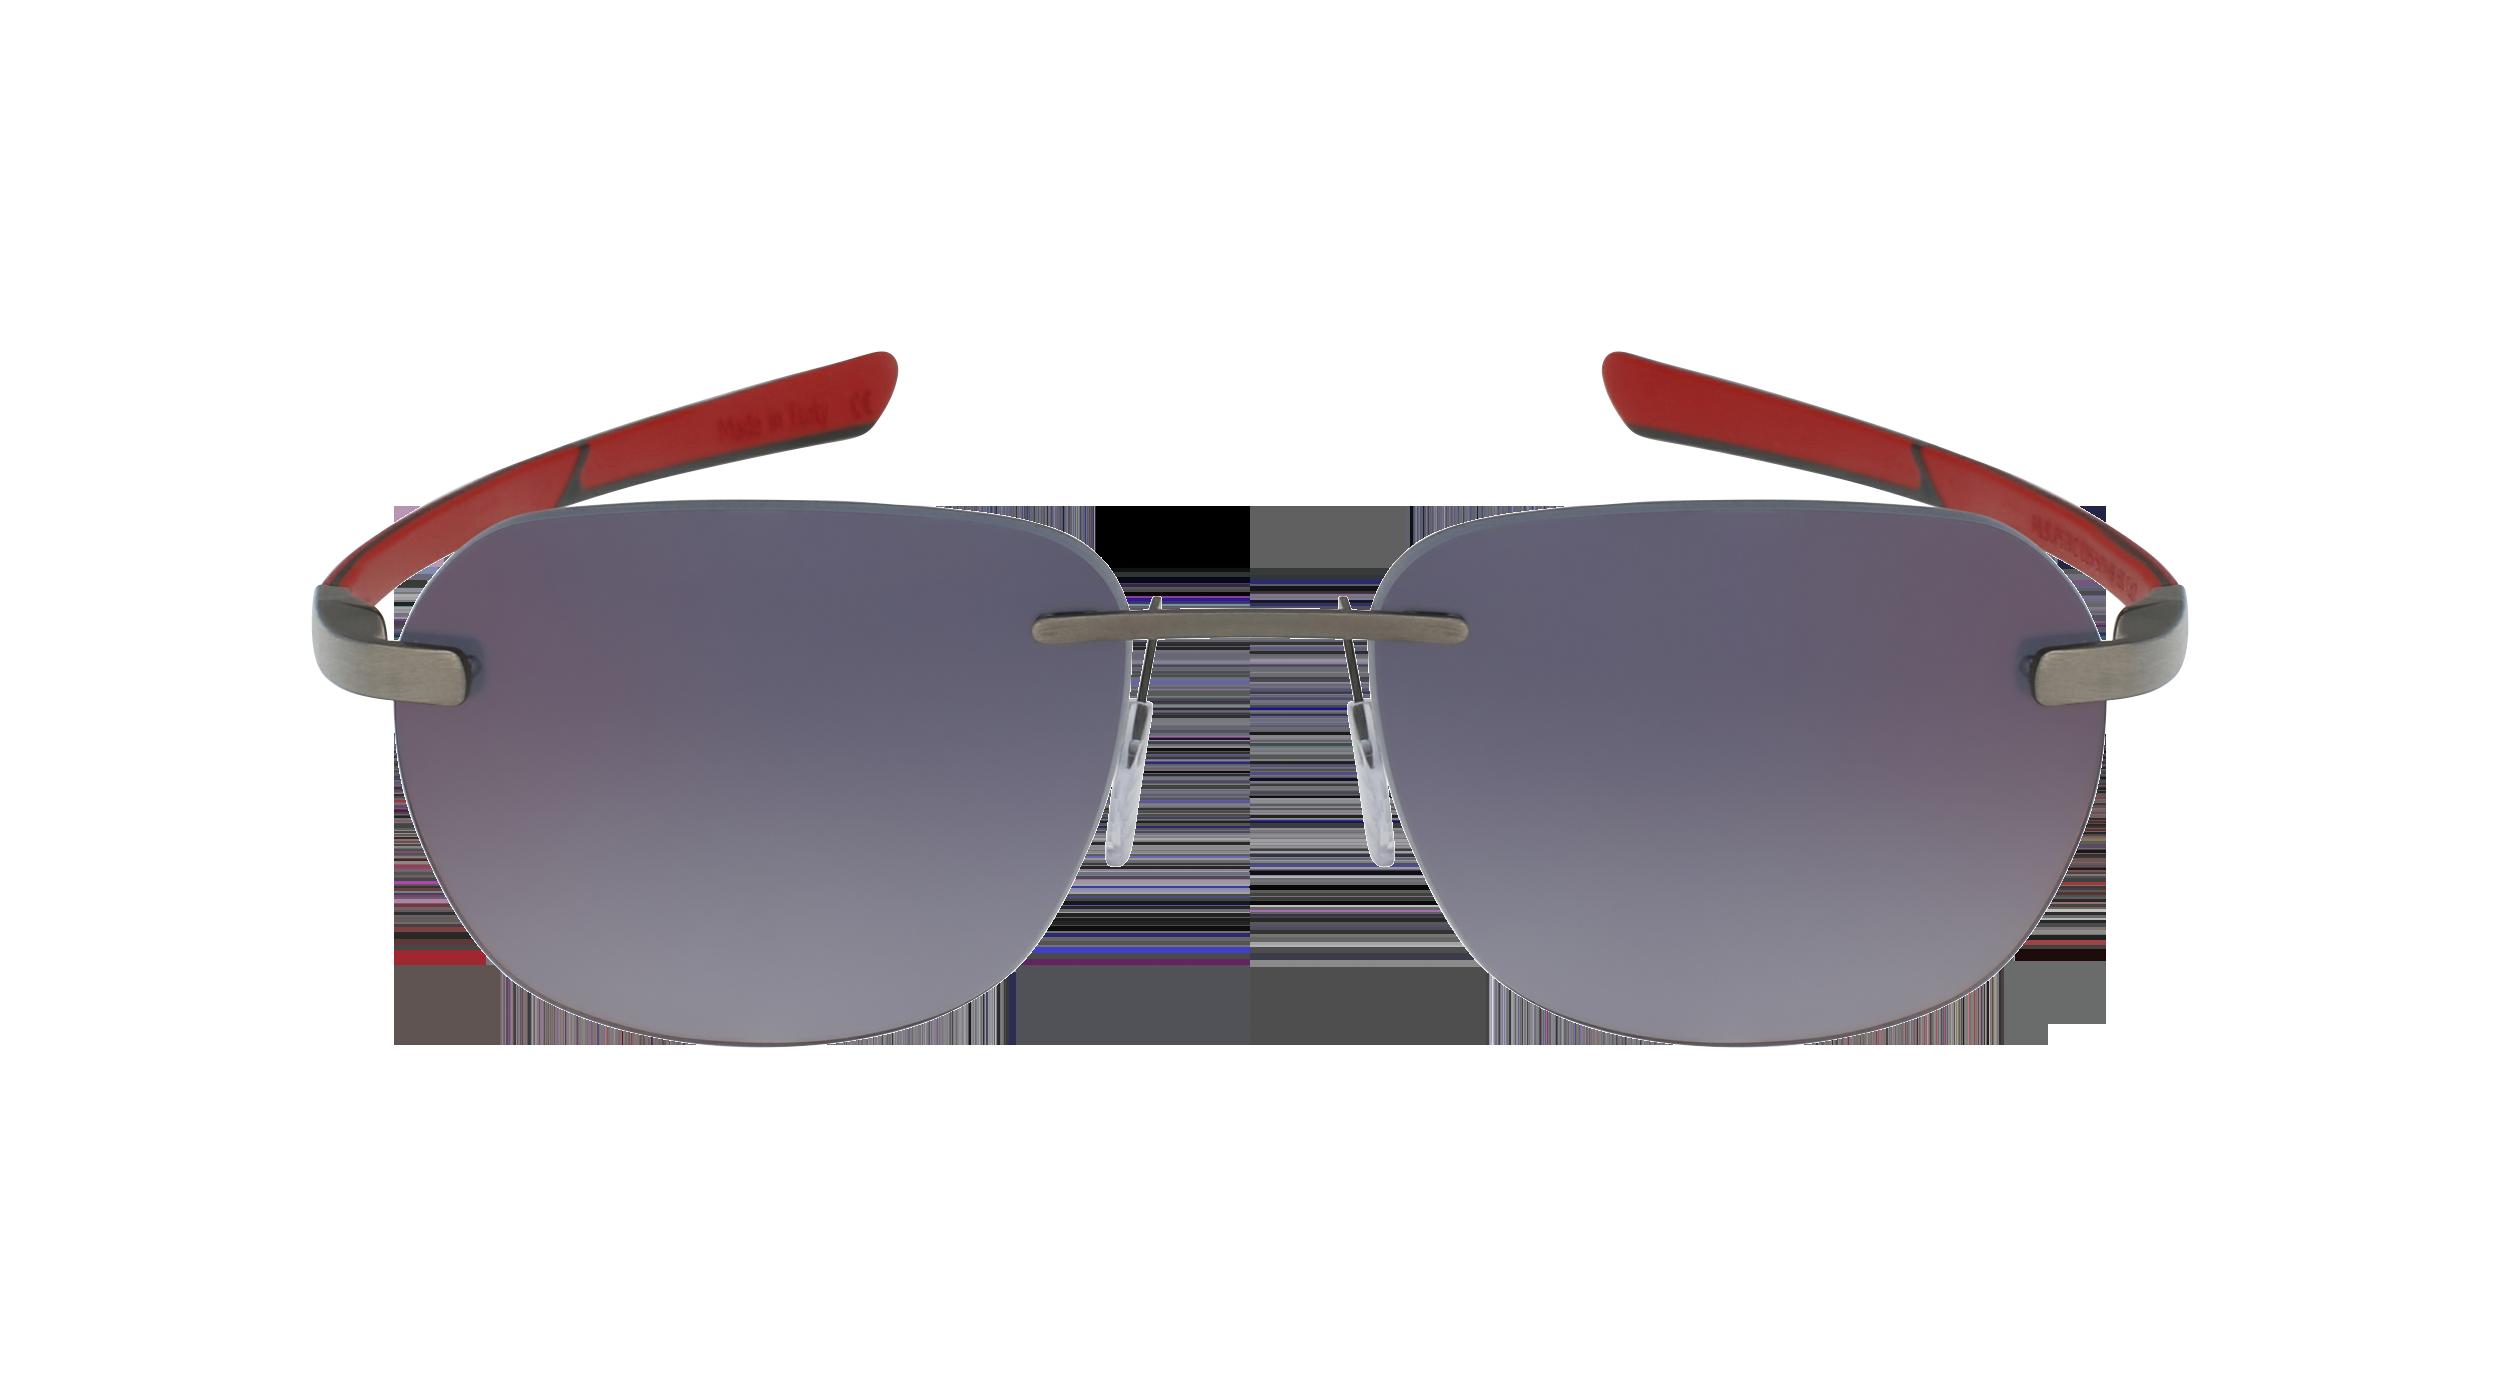 Style Name: MLSUPS19.C05.57